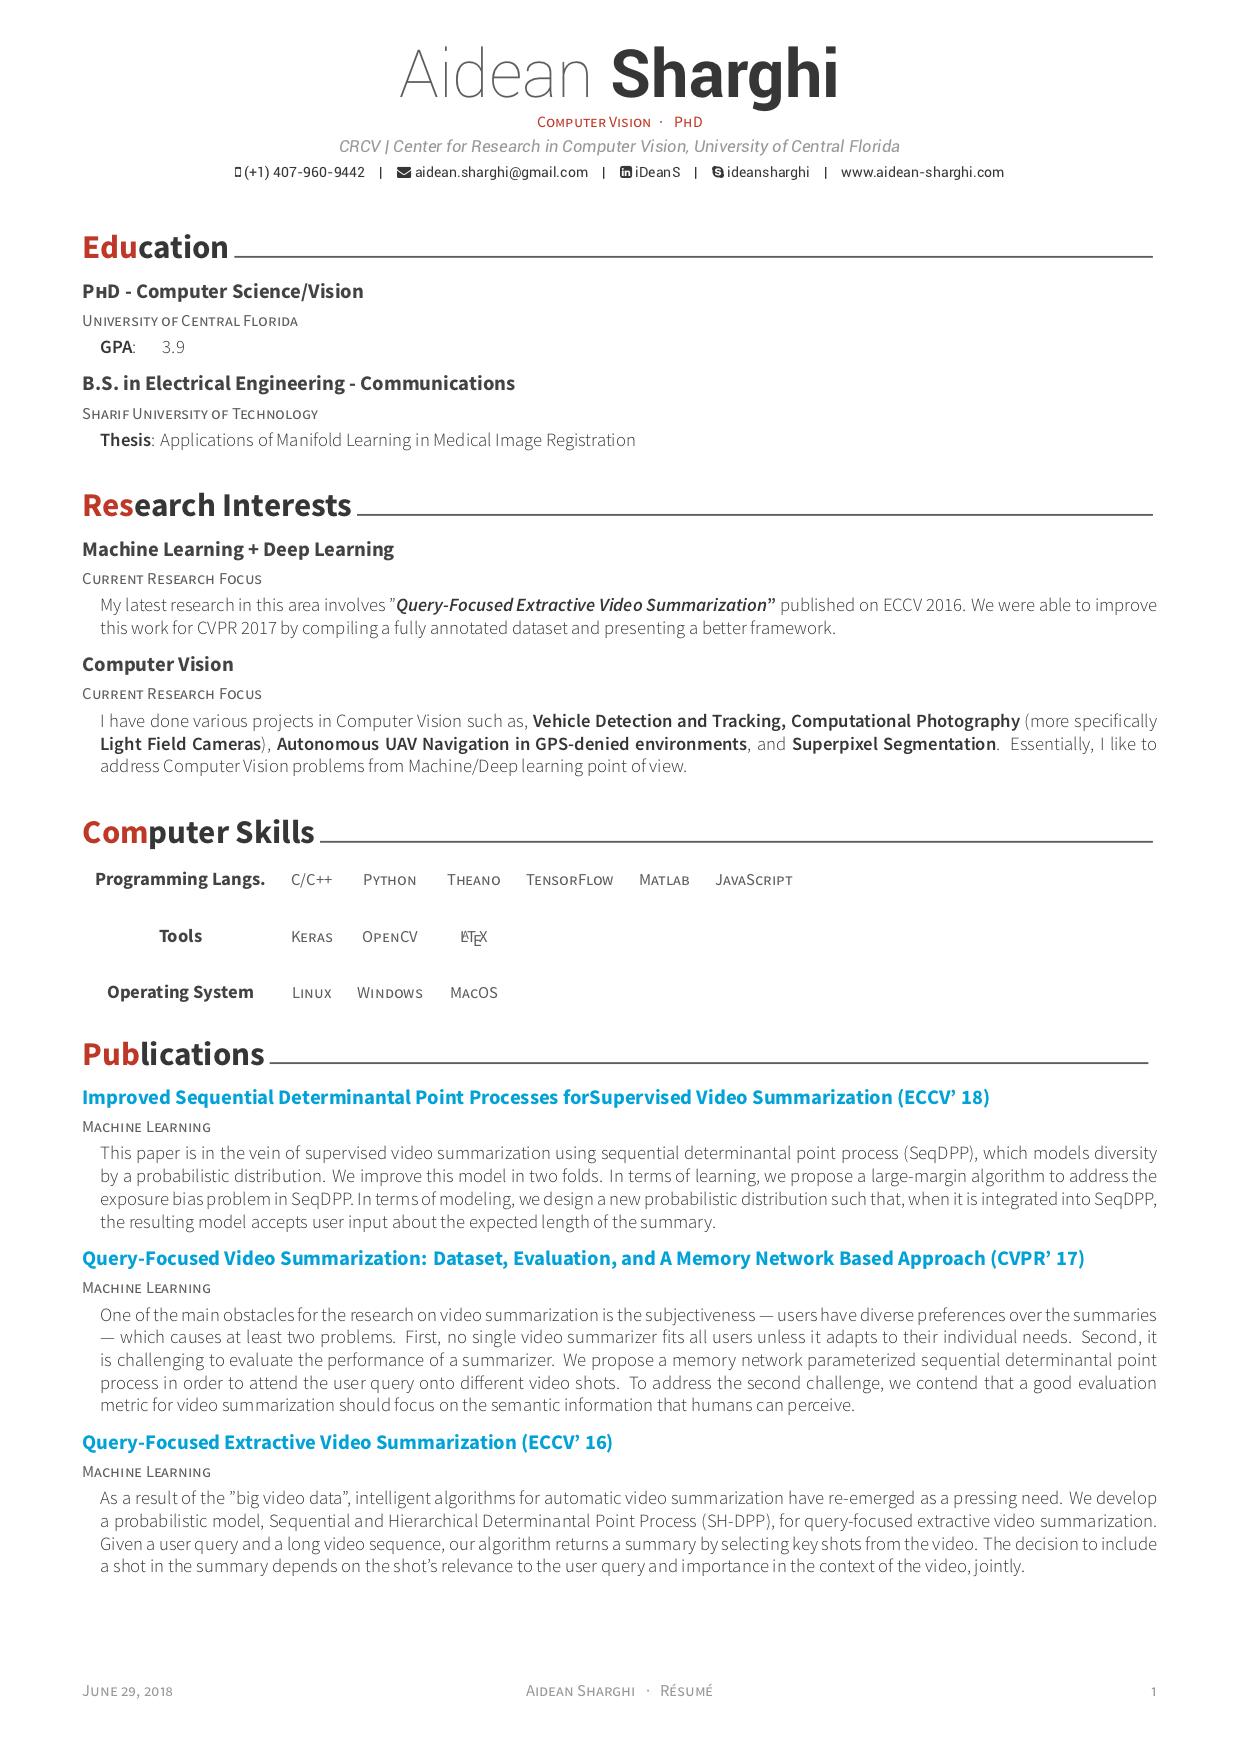 resume1.jpg